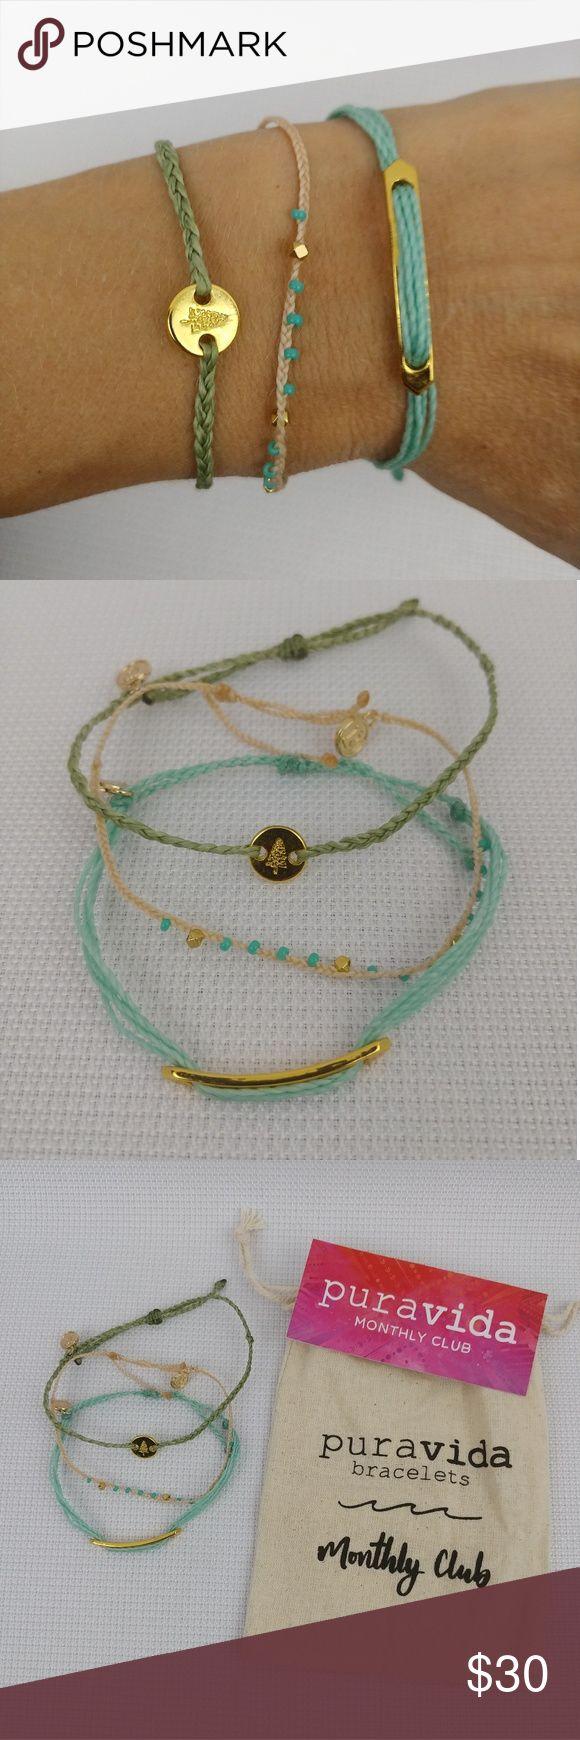 3 pura vida December 2017 monthly Club bracelets Brand new Pura Vida Jewelry Bracelets